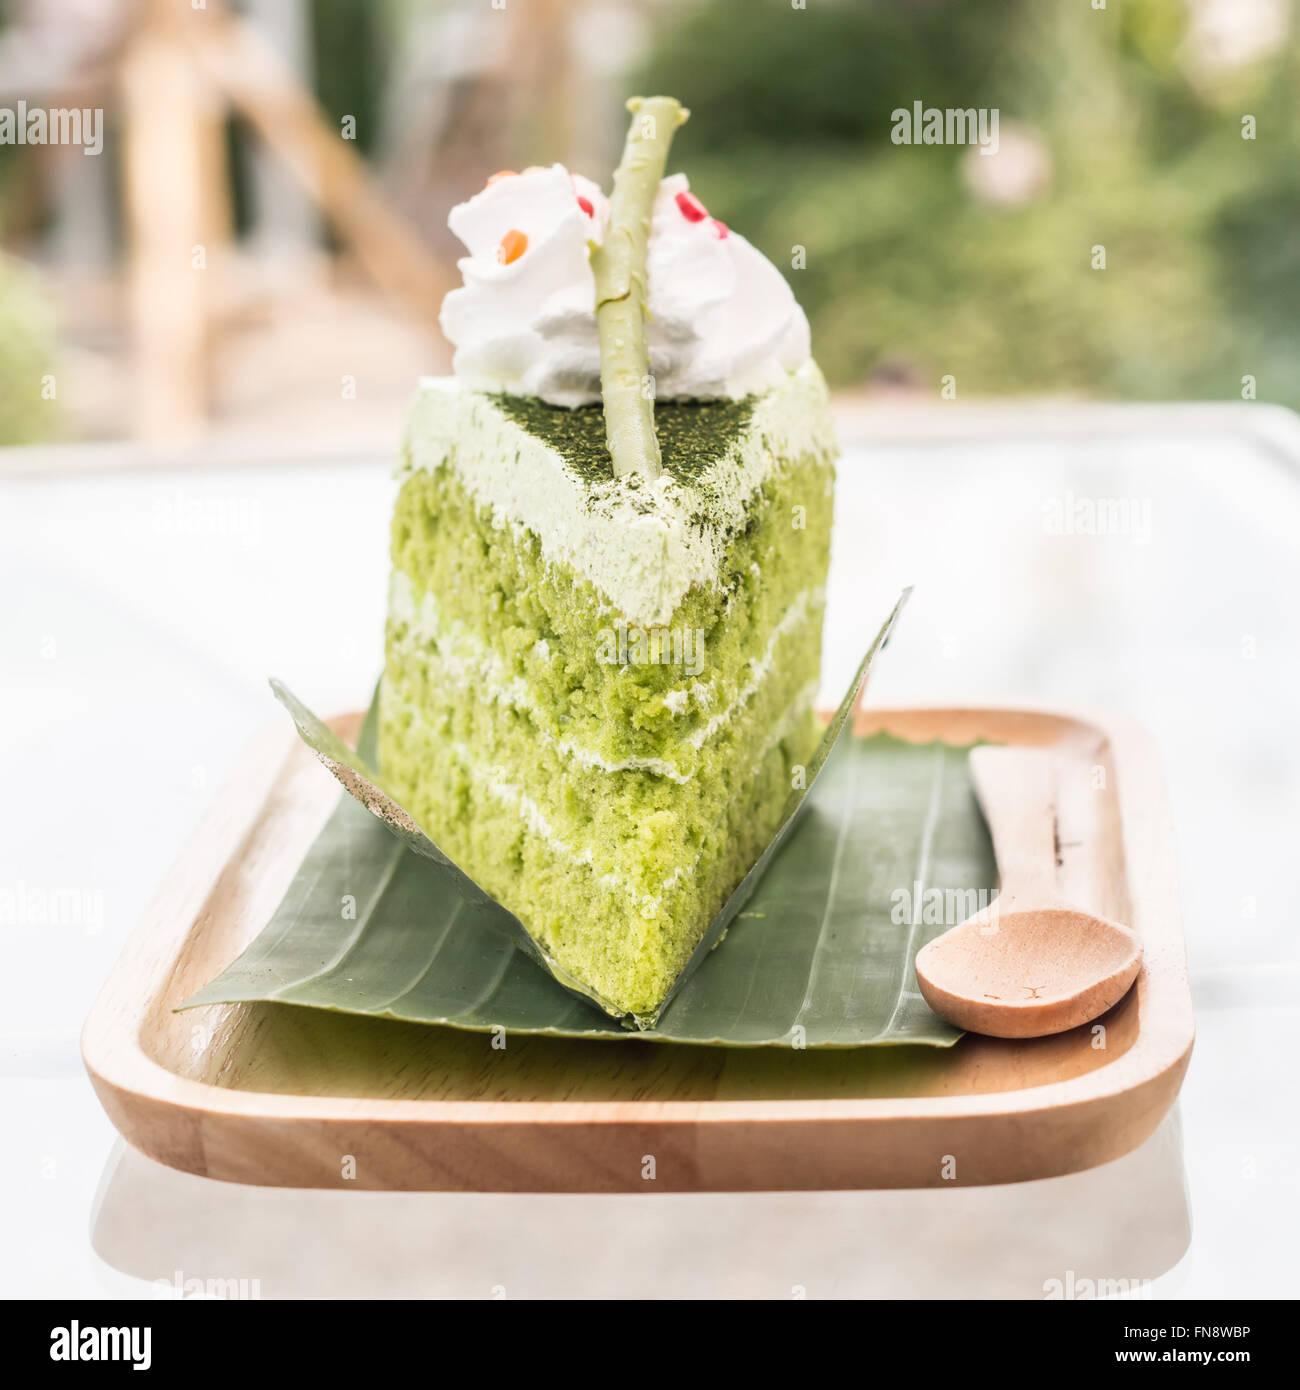 Green tea cake - Stock Image